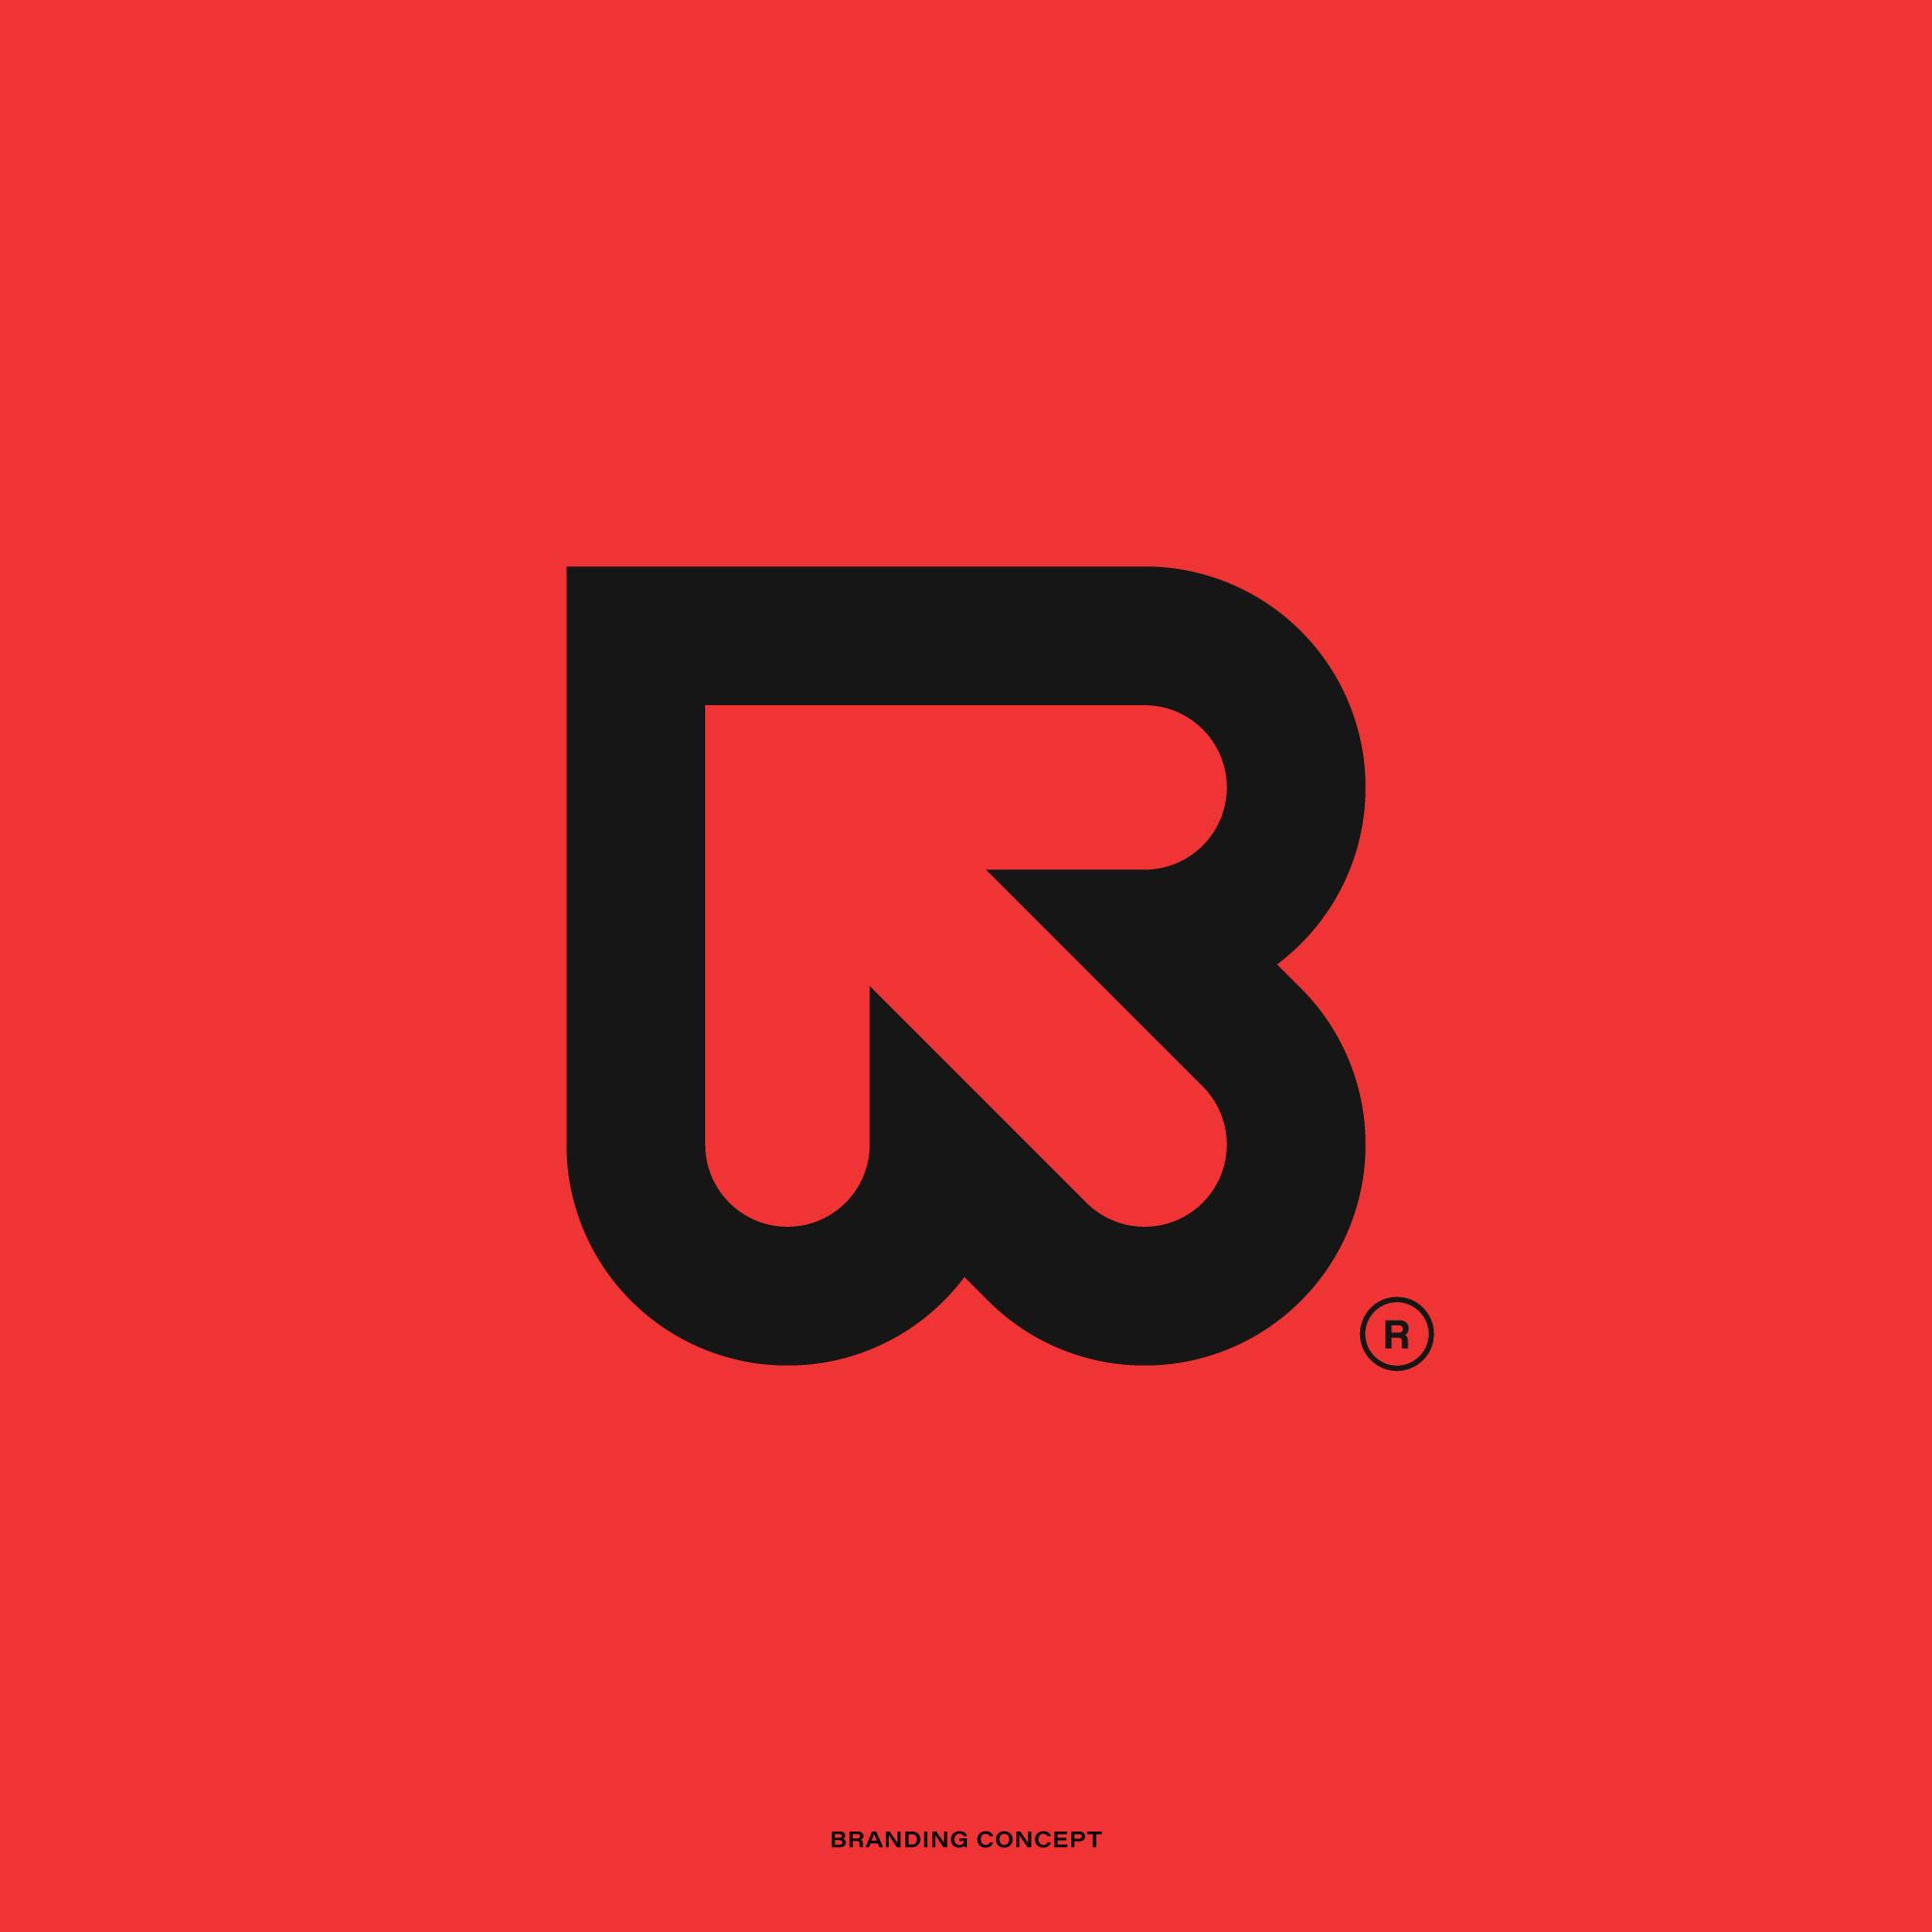 R Arrow logo